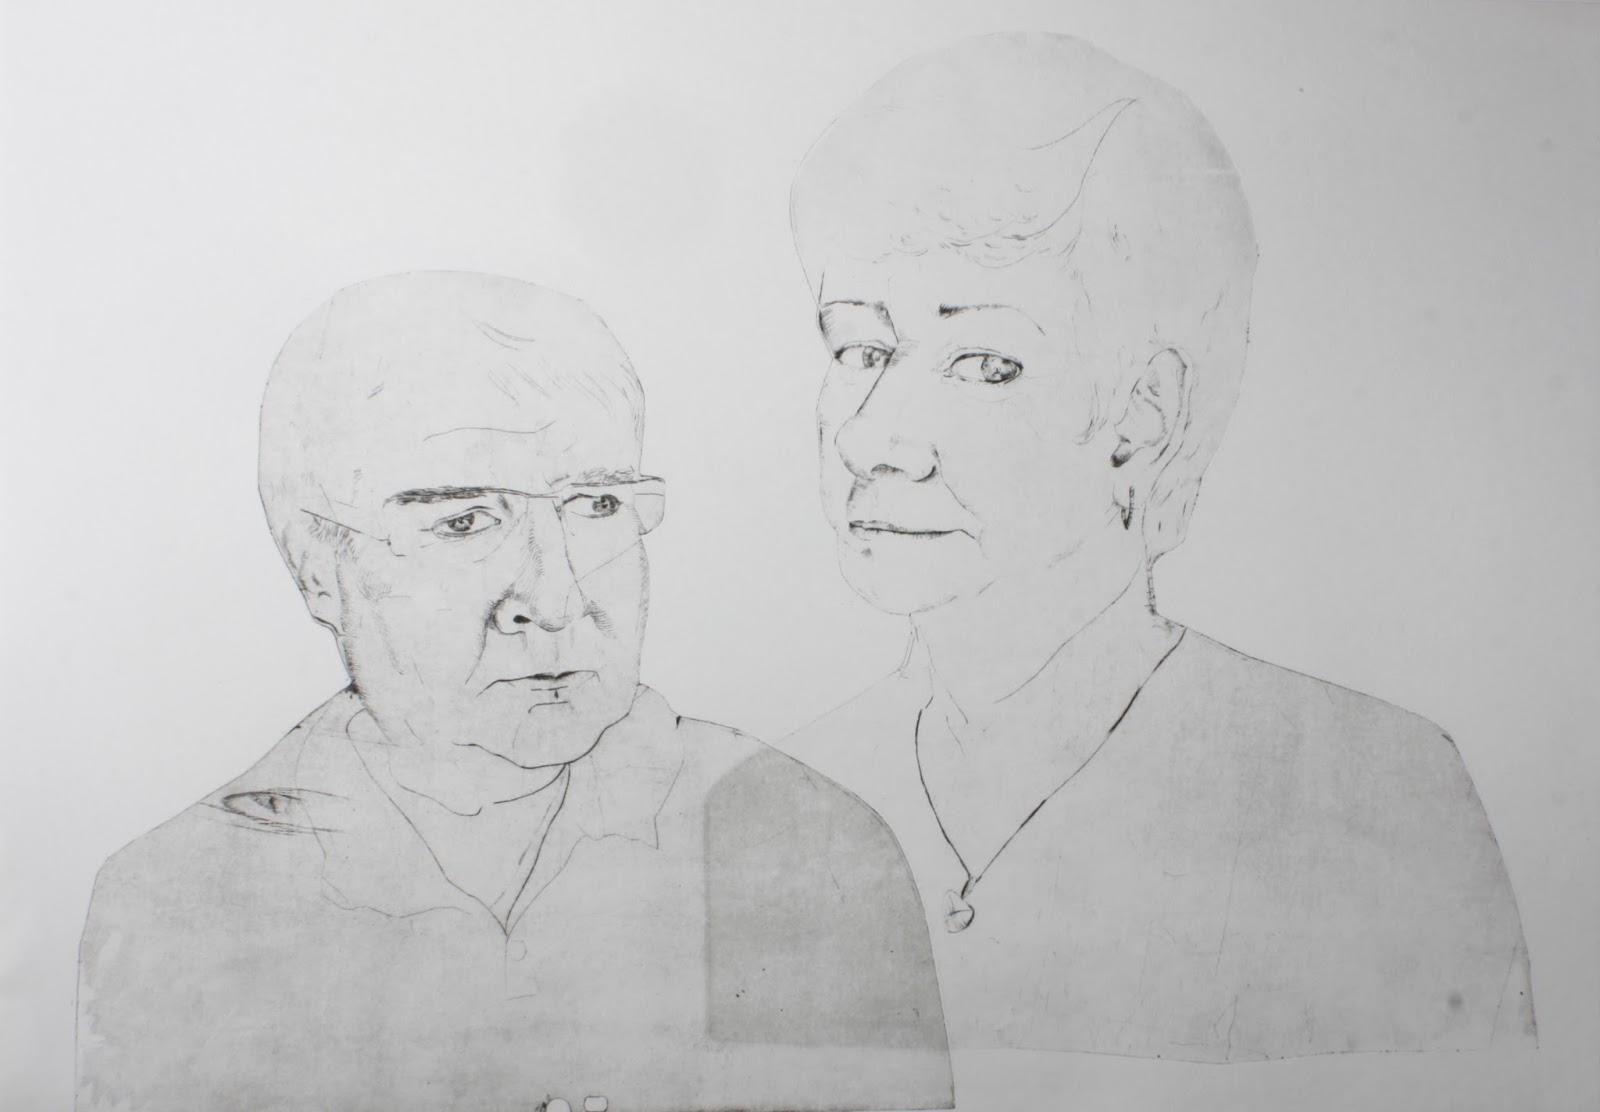 Barbora Dusatkova Rodinny Portret B2 Sucha Jehla B0 Kresba Tuzkou